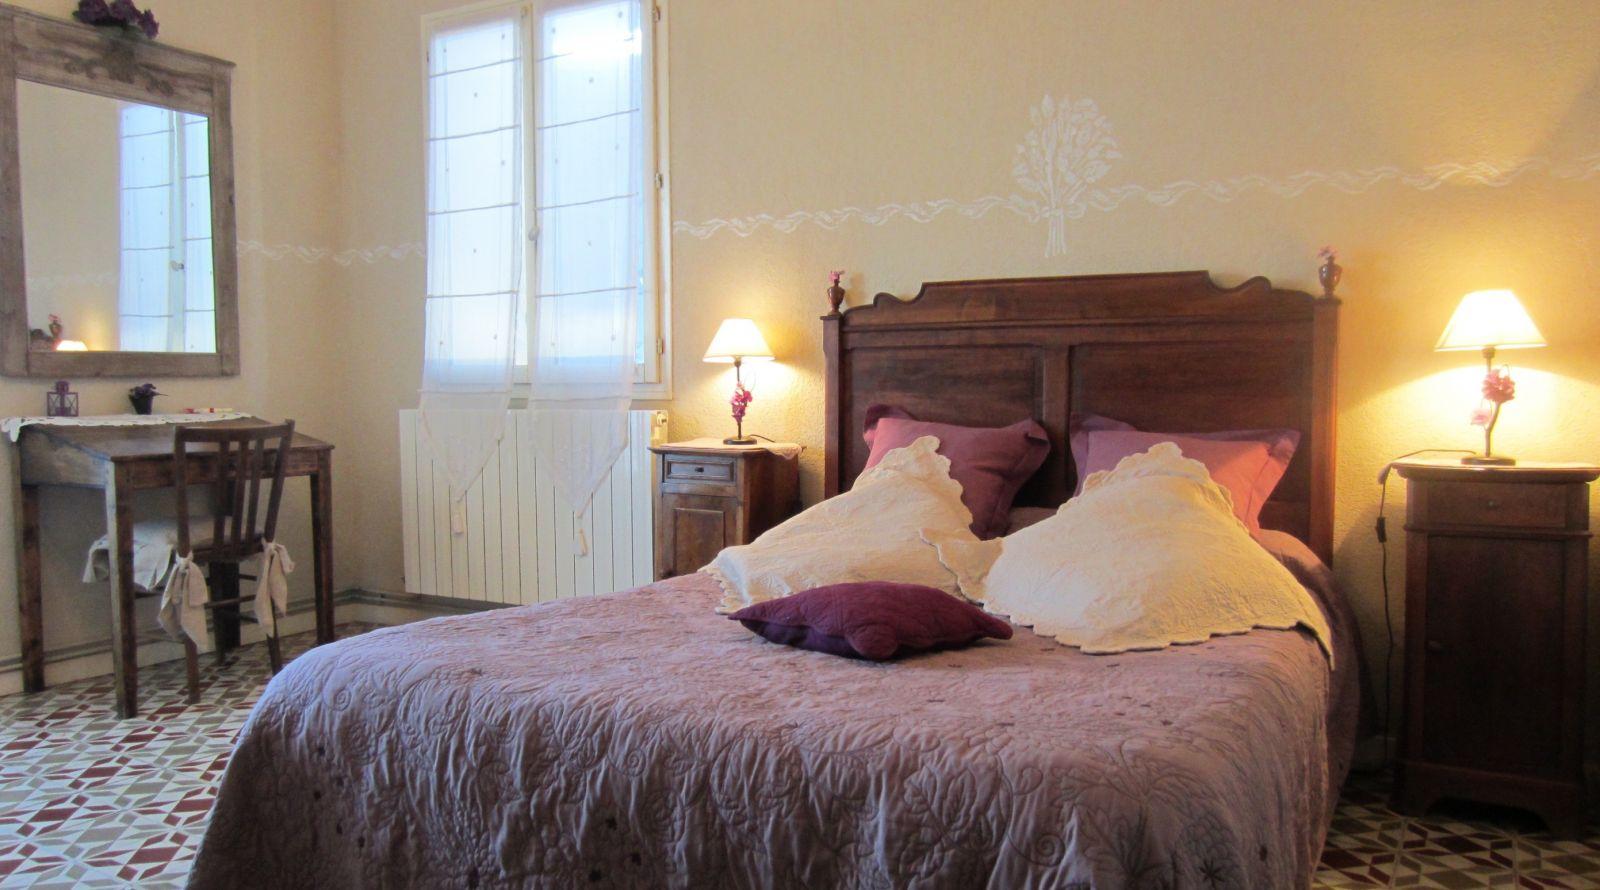 Chambres d\'hôtes in der Provence: \